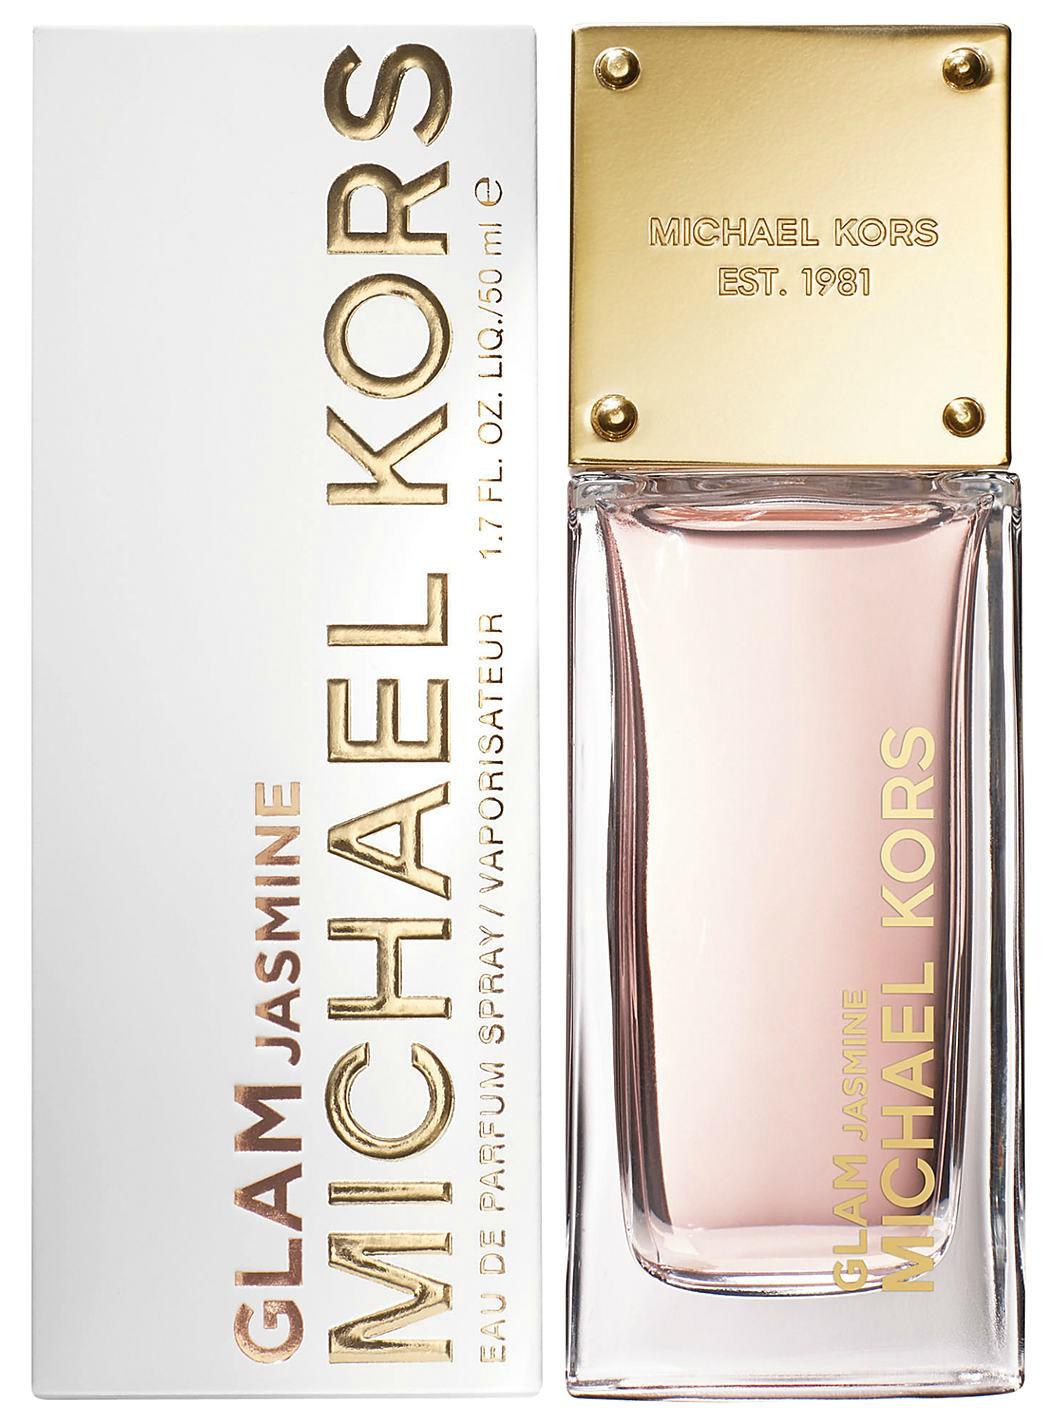 9ac382915a1 Michael Kors Glam Jasmine (100 ml   3.4 FL OZ) - Fragrance 香港香水專門店- Chanel